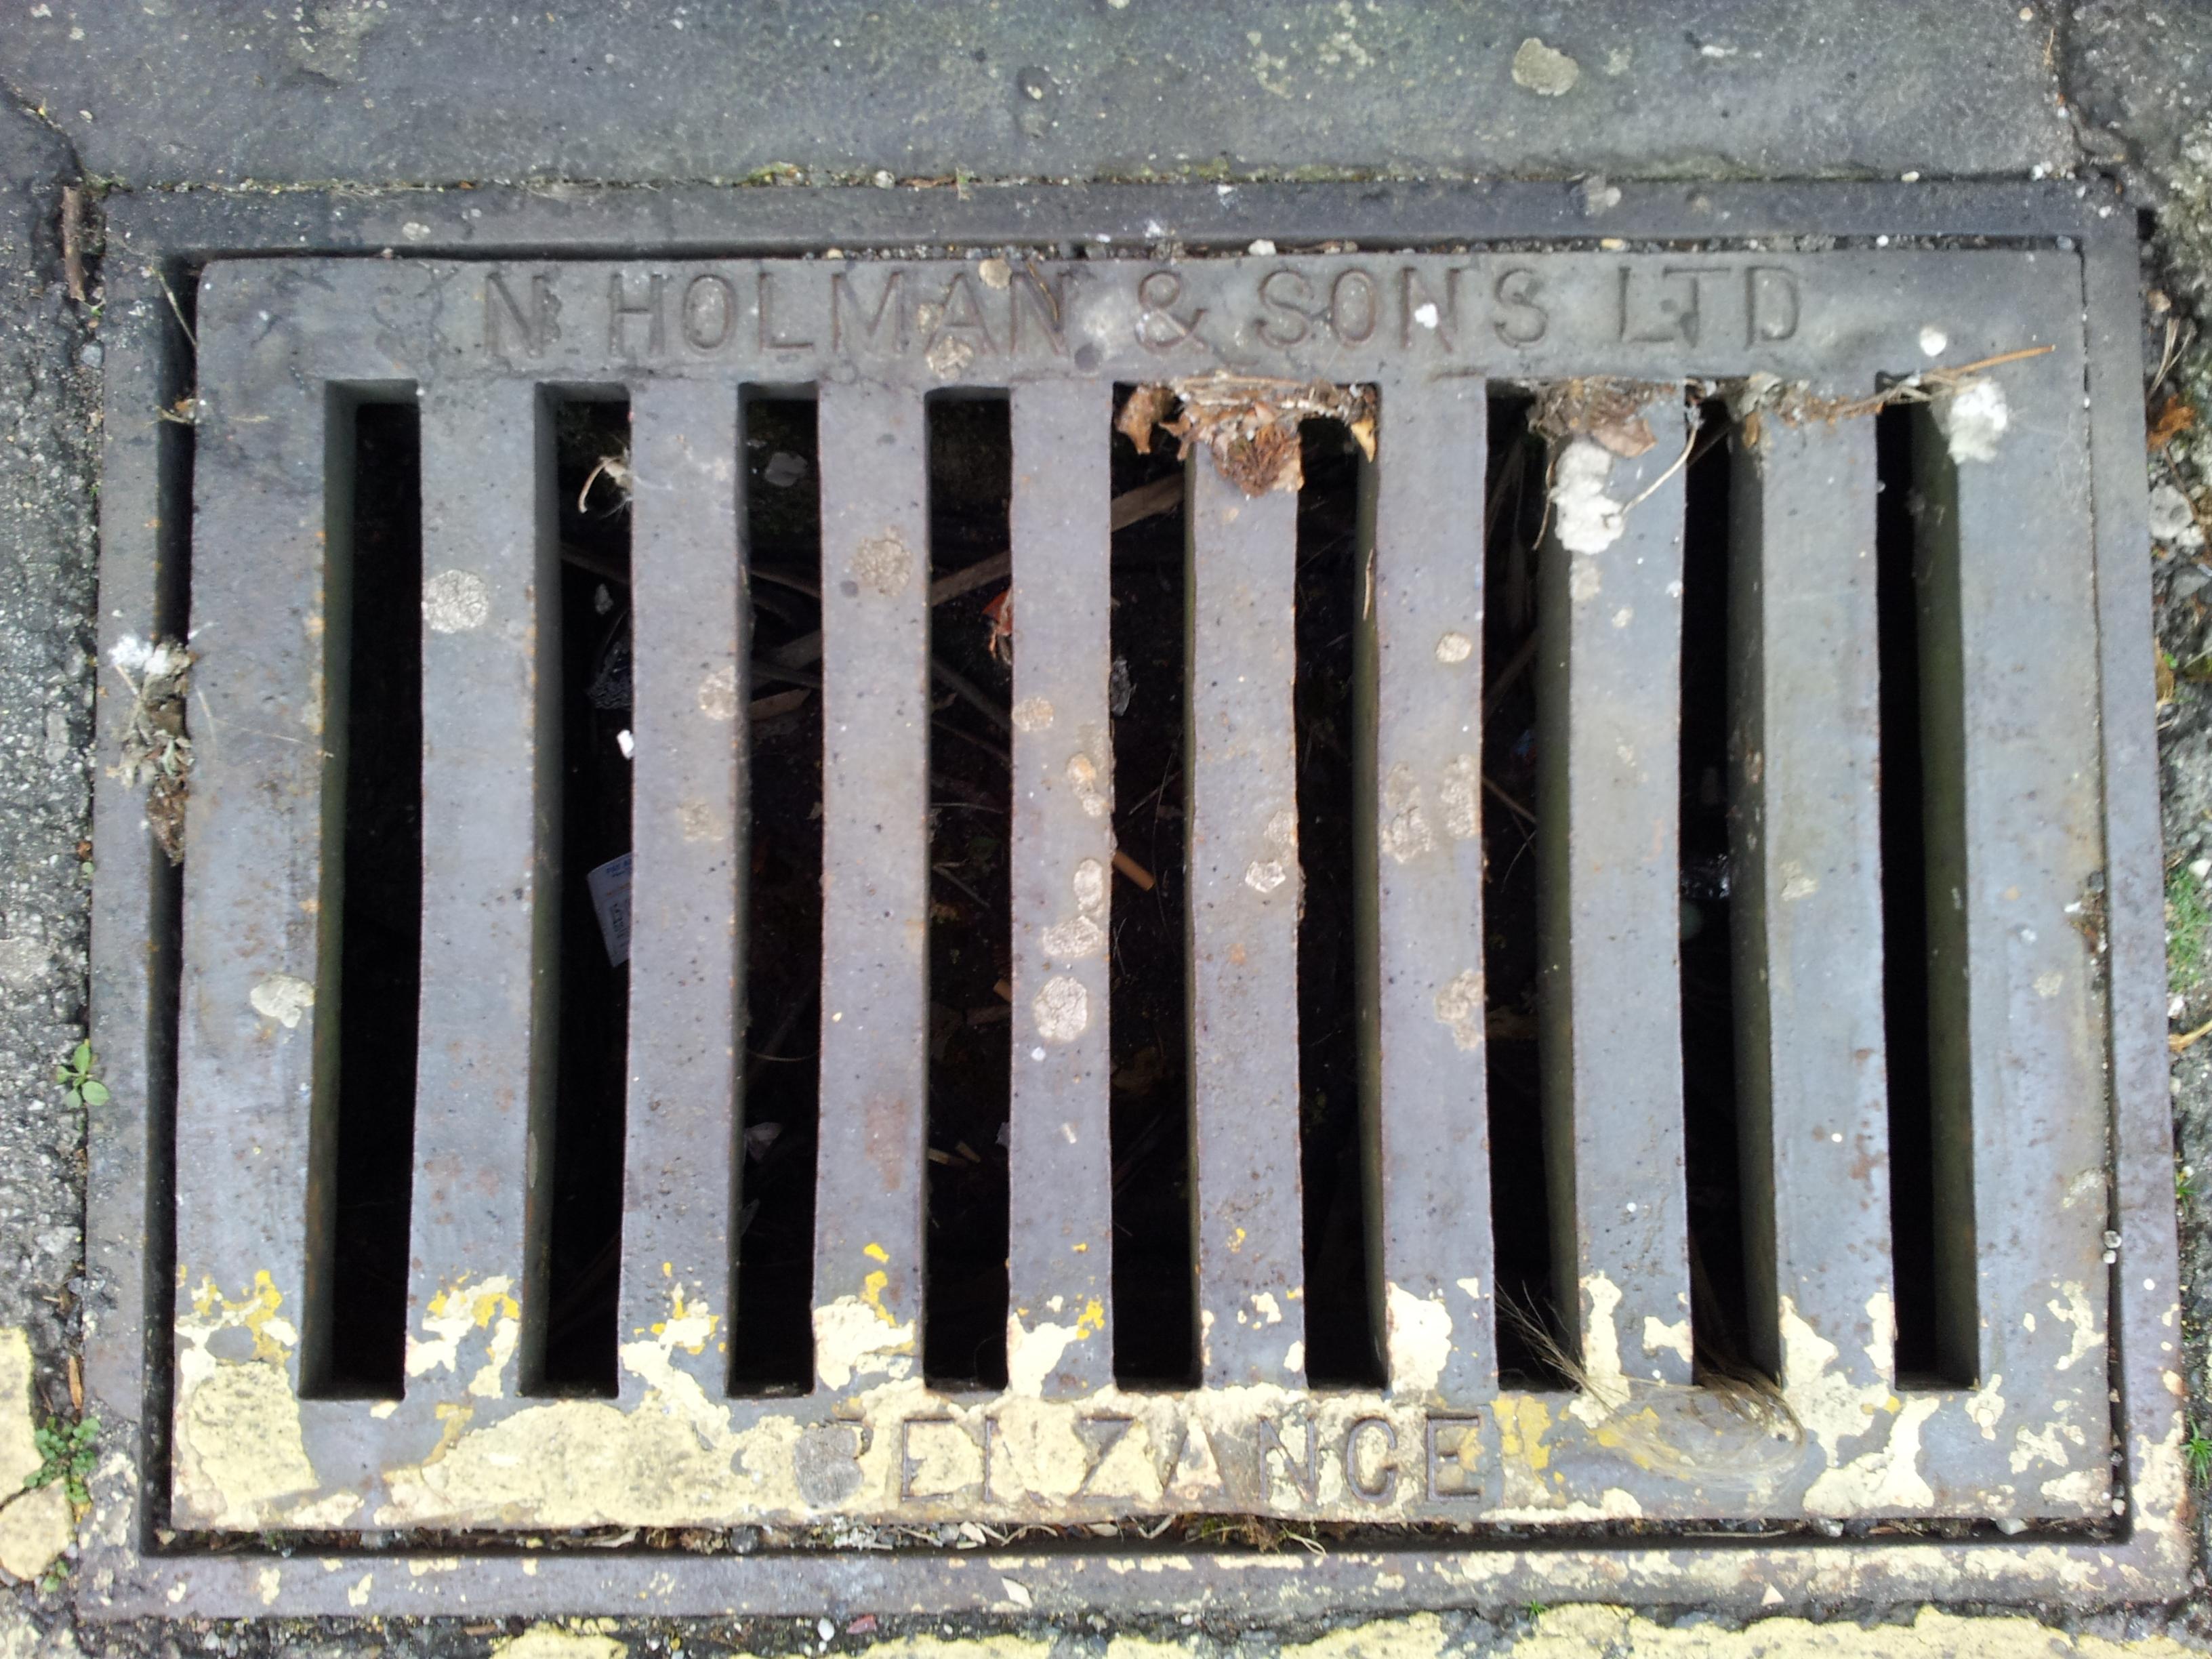 Gutter grill by N. Holman and Sons Ltd, Penzance (Belgravia Street, Penzance)